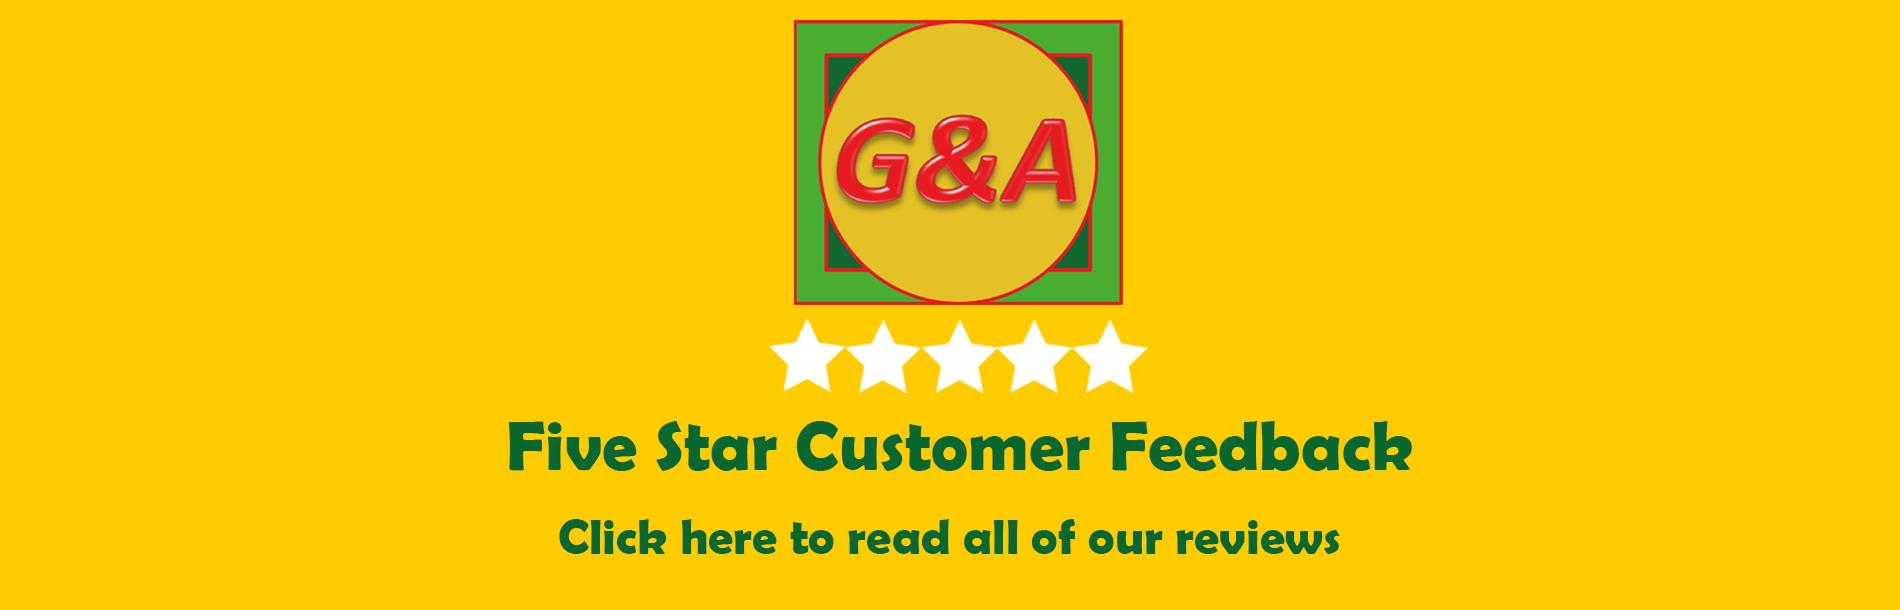 Reviews - Customer feedback